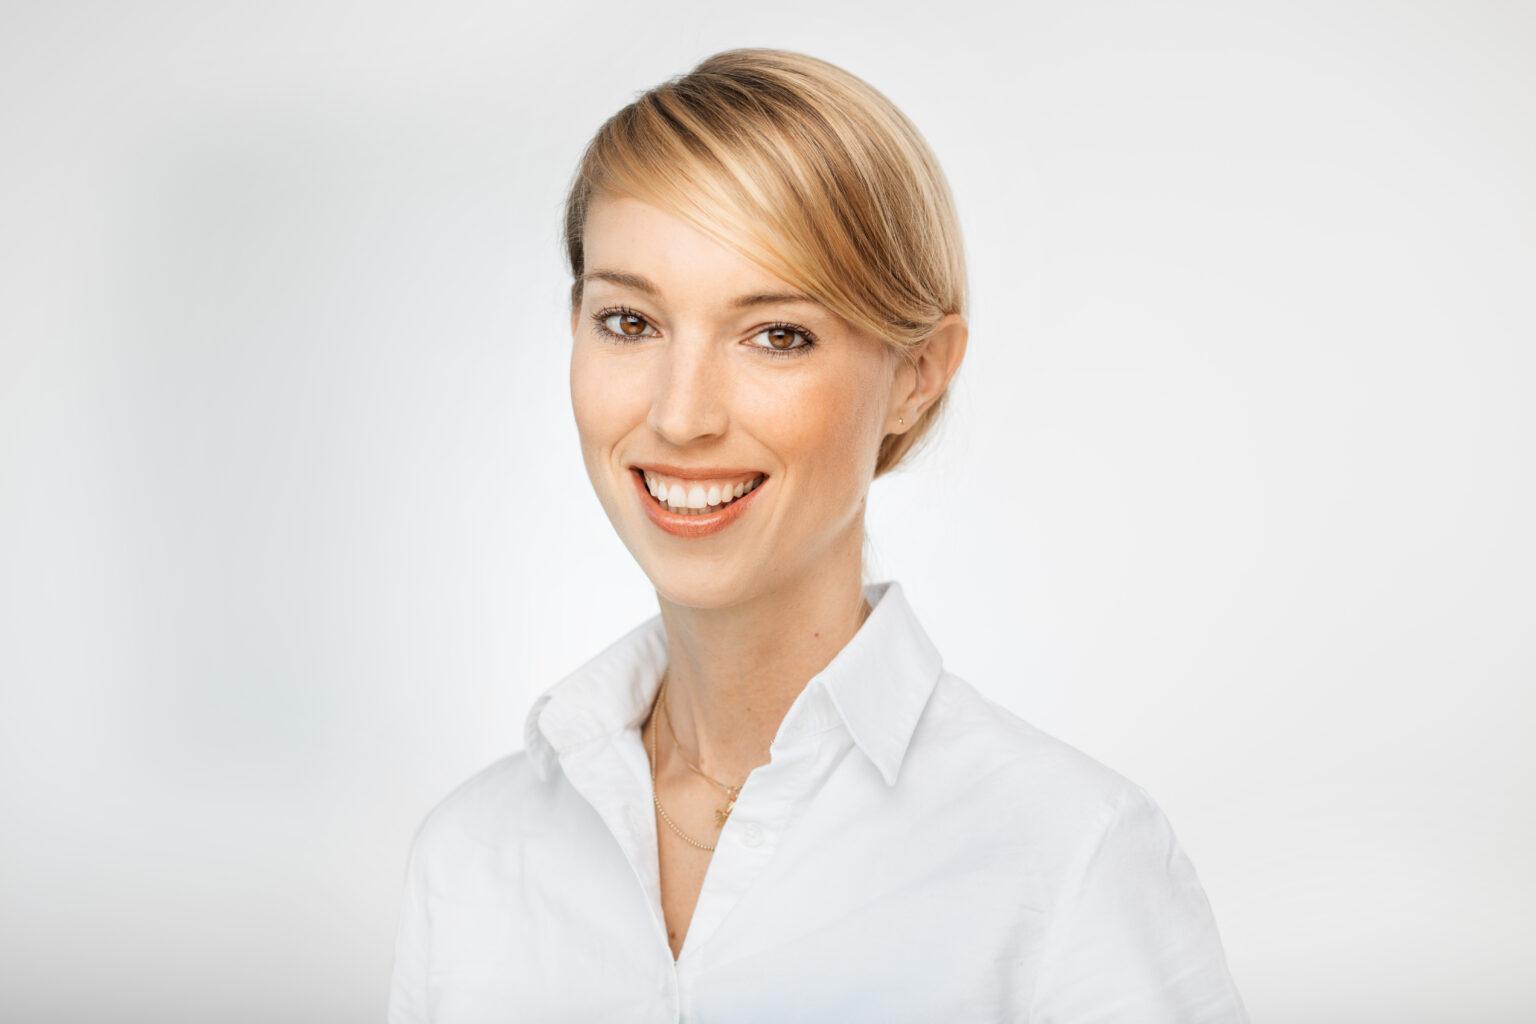 Gesichter Lea Maria Siering